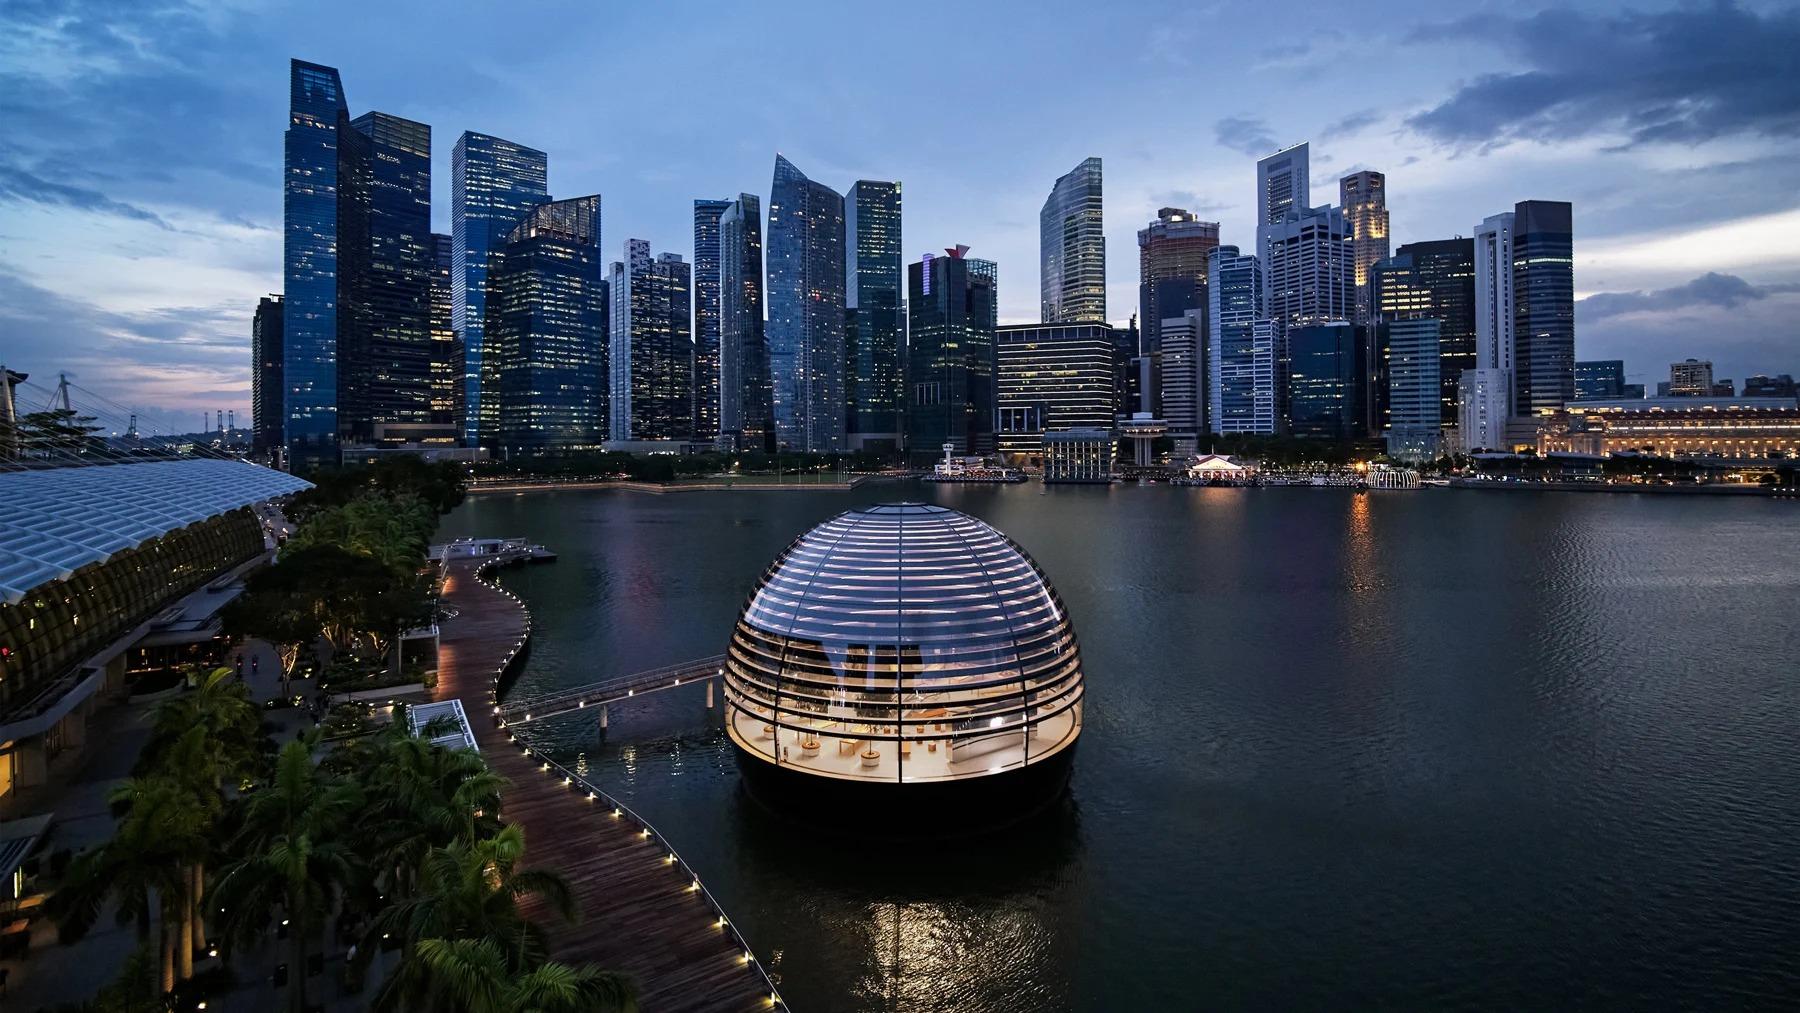 Apple Marina Bay Sands, Singapur, de Foster+Partners